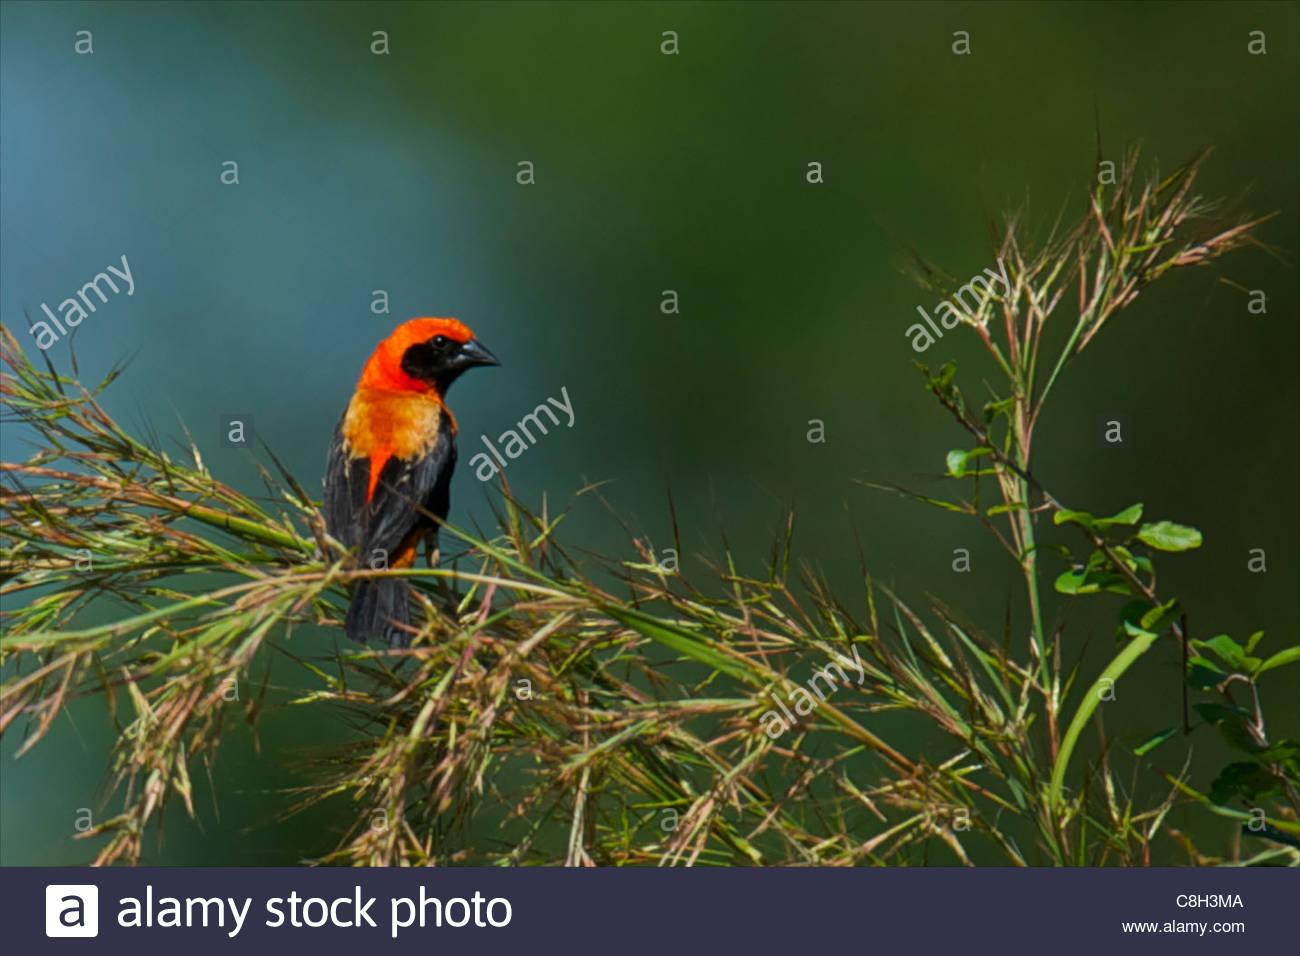 Unidentified bird in Mozambique's Niassa Reserve. - Stock Image